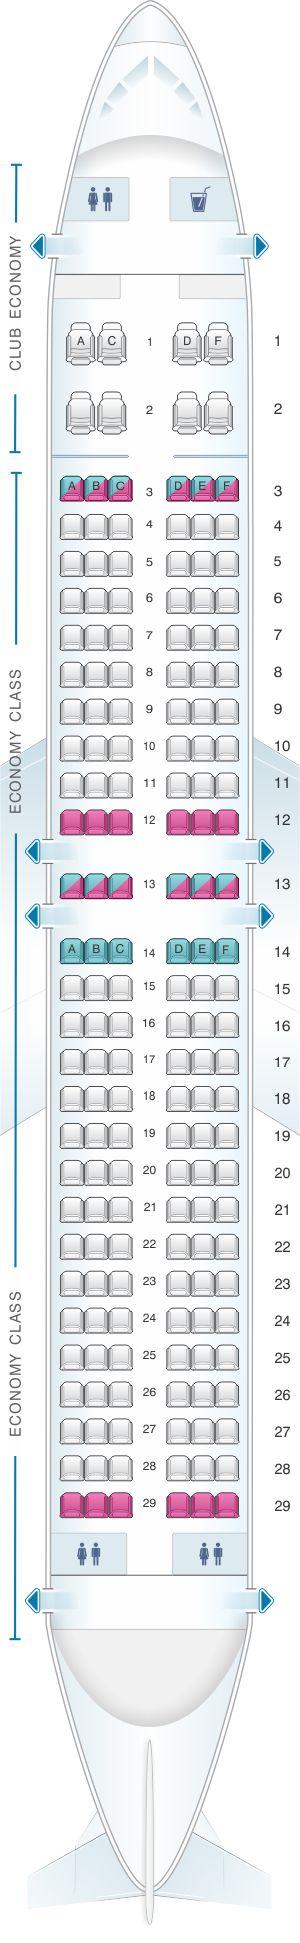 Seat Map Aerolineas Argentinas Boeing B737 800